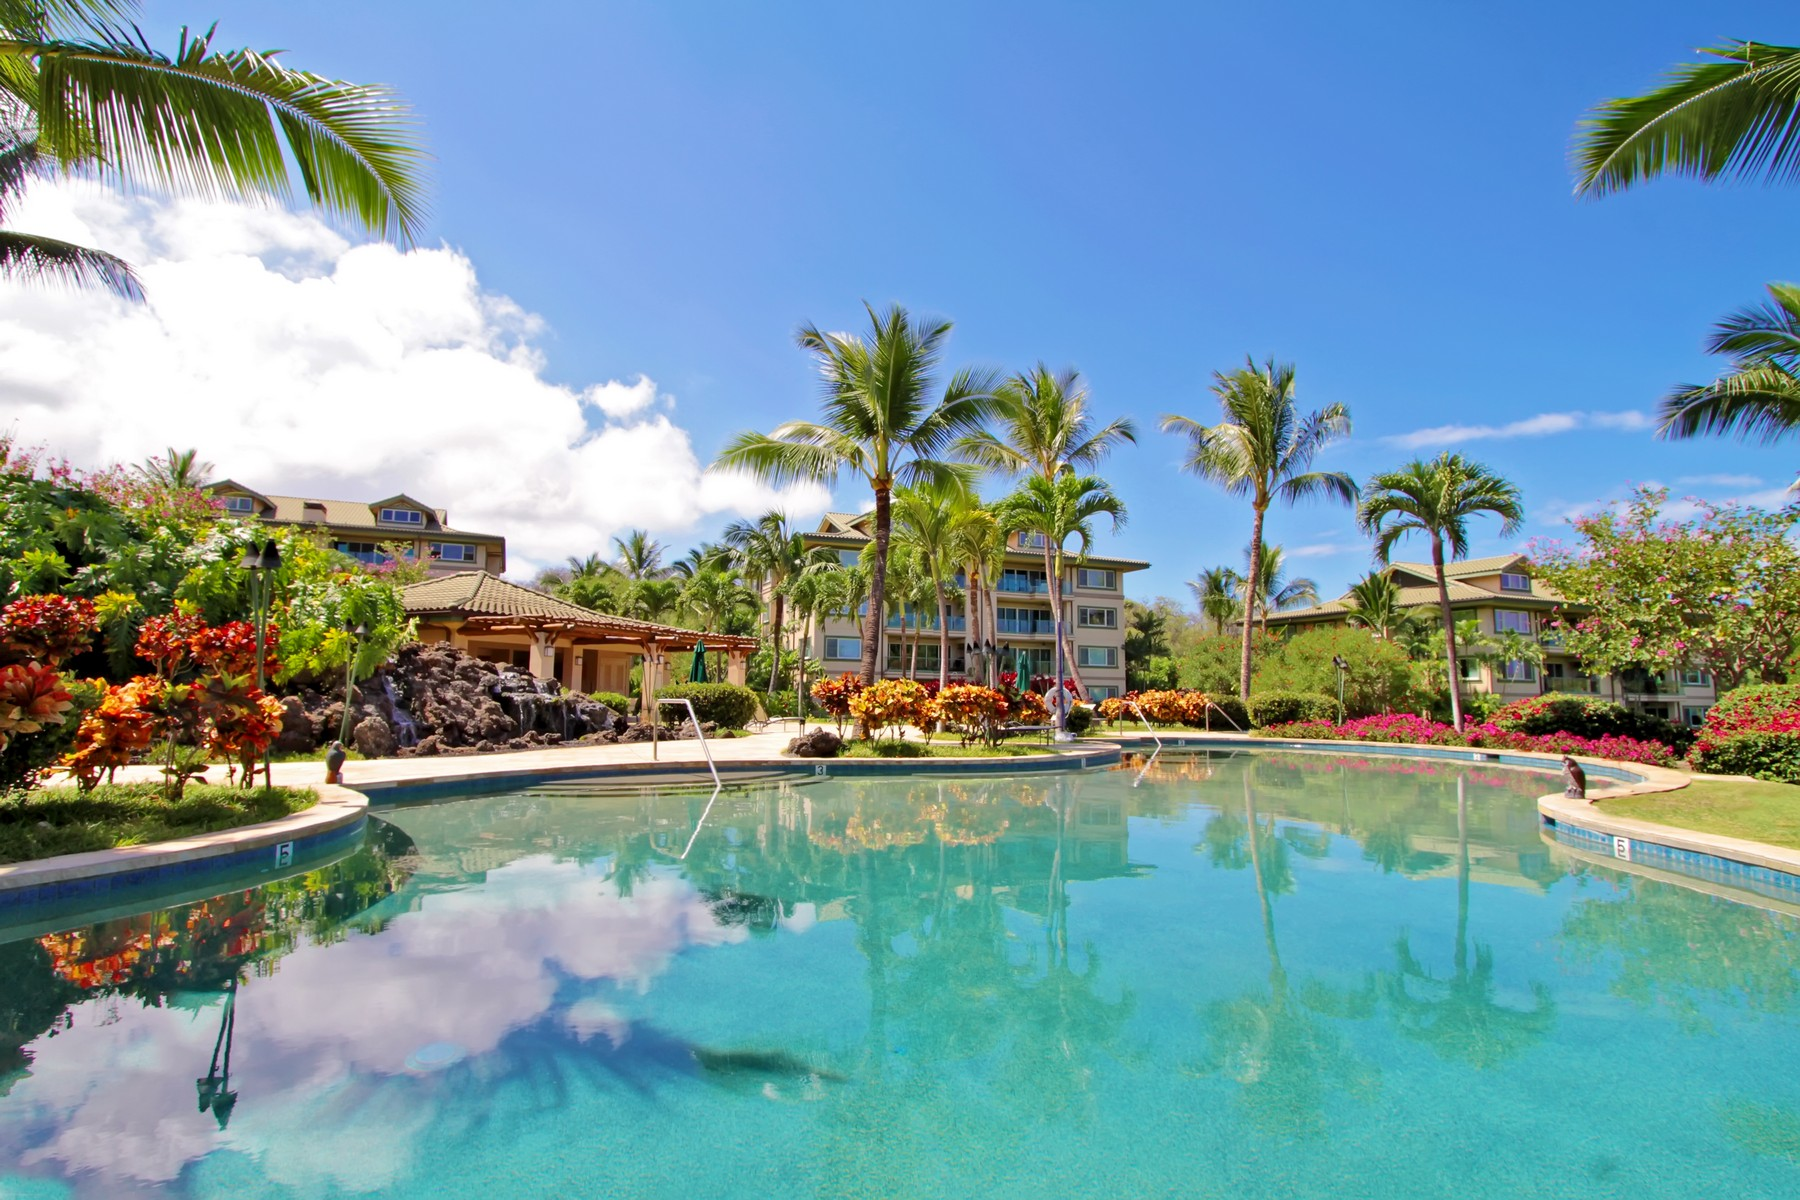 Condominium for Sale at Inspired Island Living Makena Style 4955 Makena Road, Na Hale O Makena D-201 Makena, Hawaii, 96753 United States